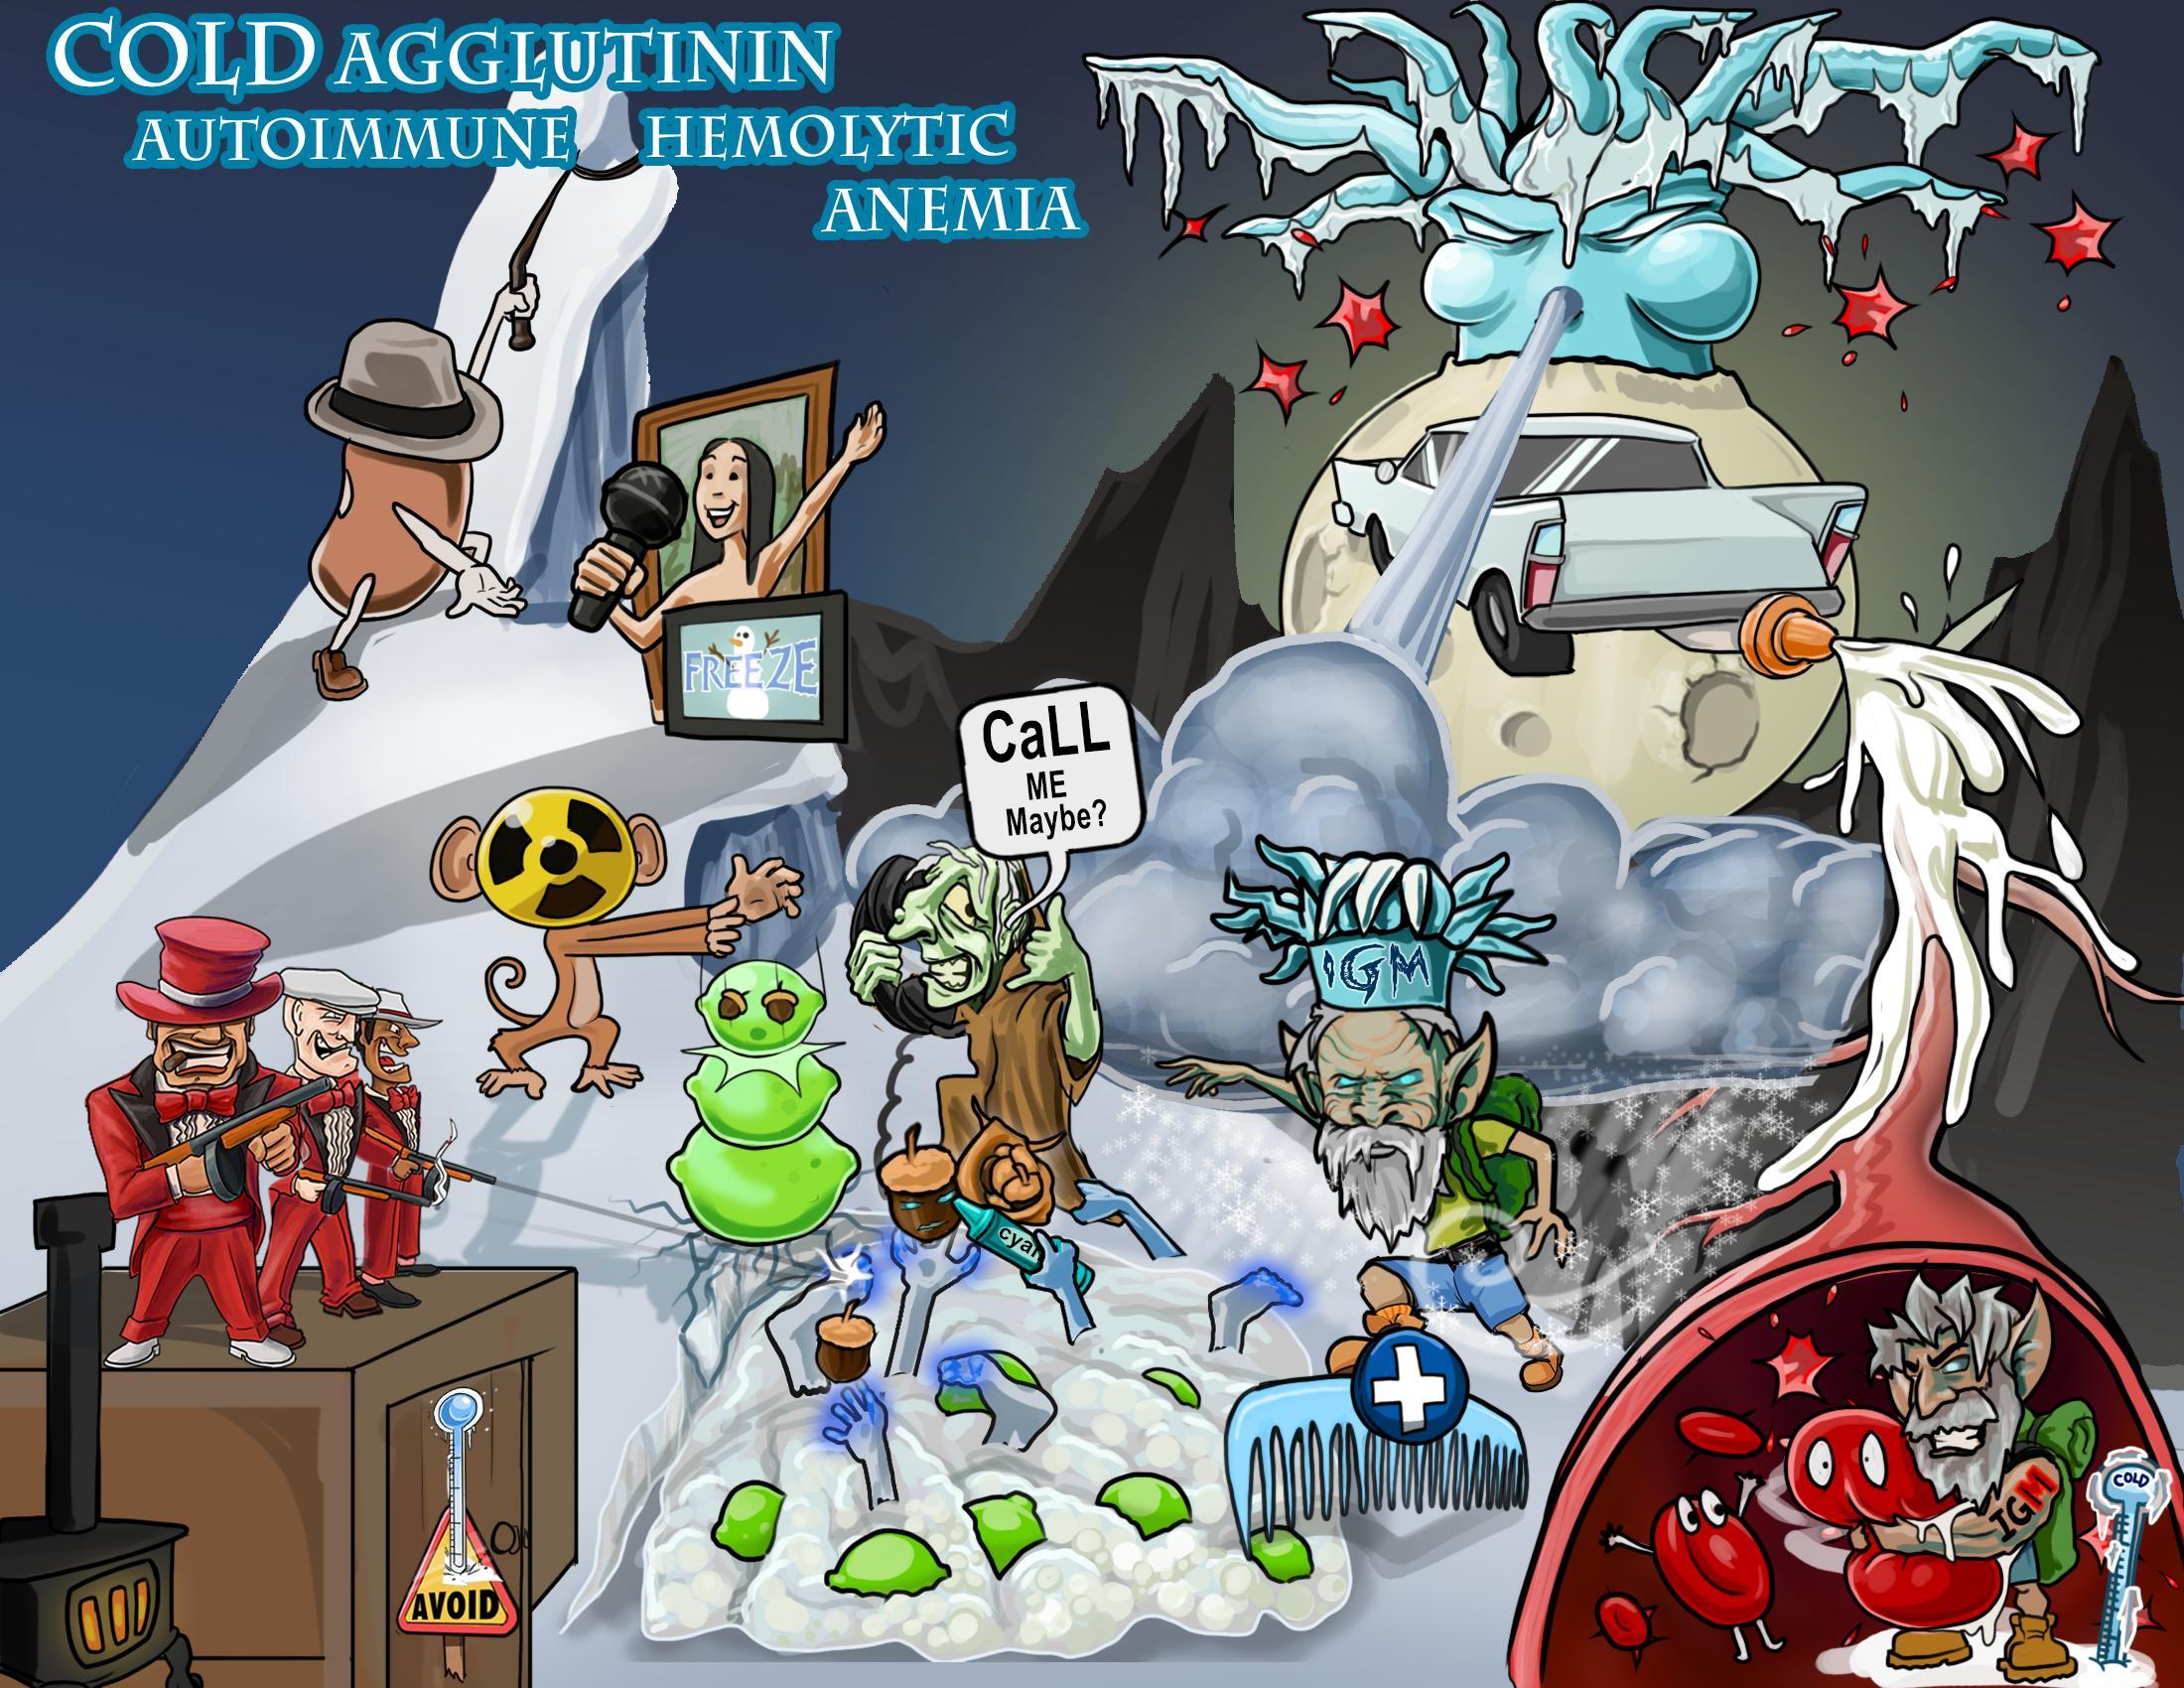 Cold Agglutinin Autoimmune Hemolytic Anemia (C-AIHA)